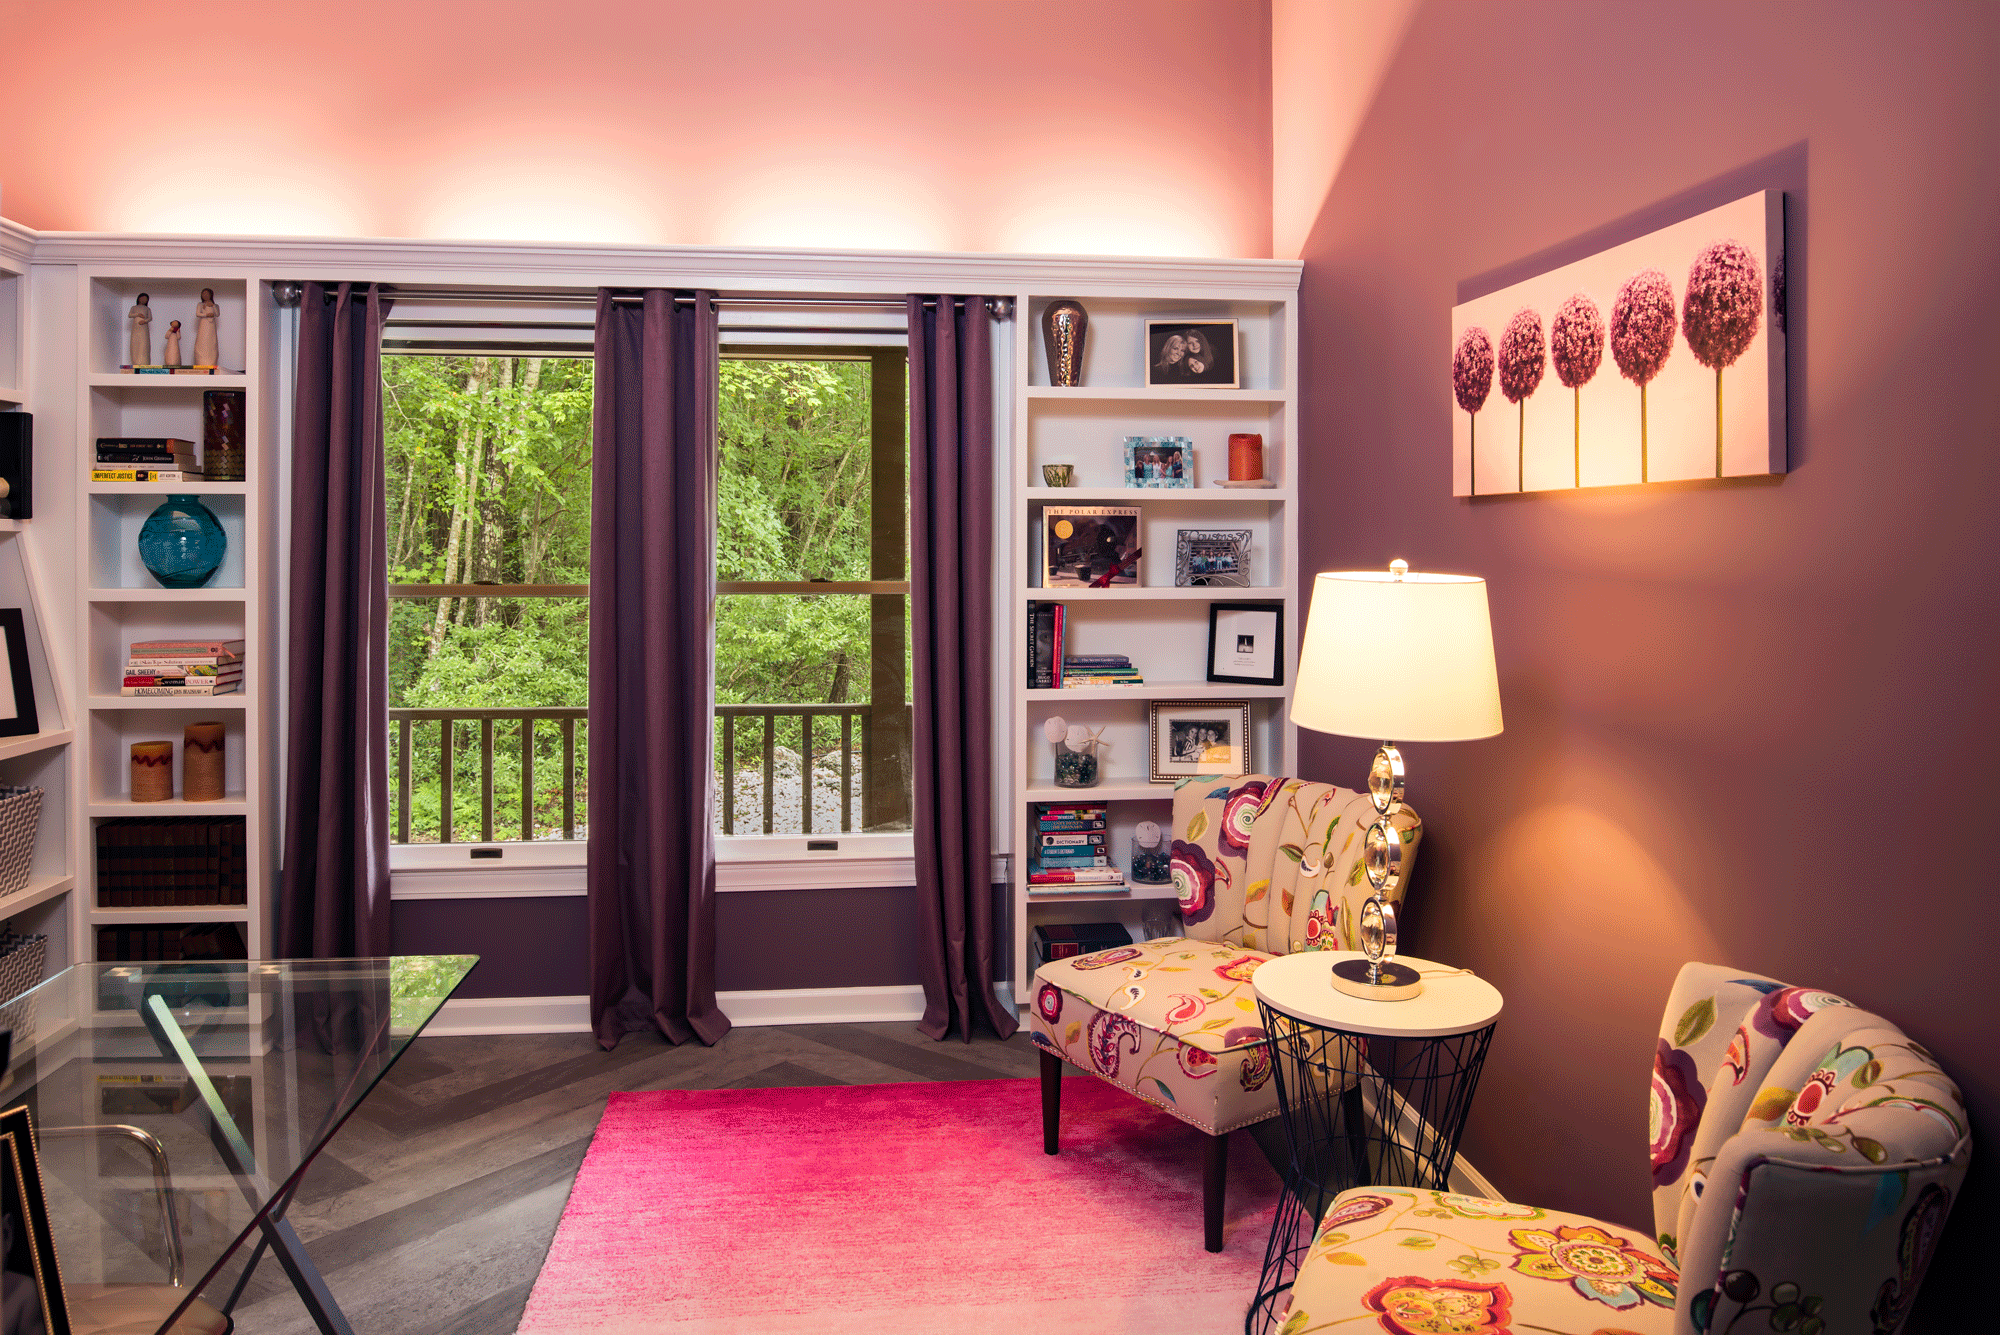 Office design with decor, paint color, drapes